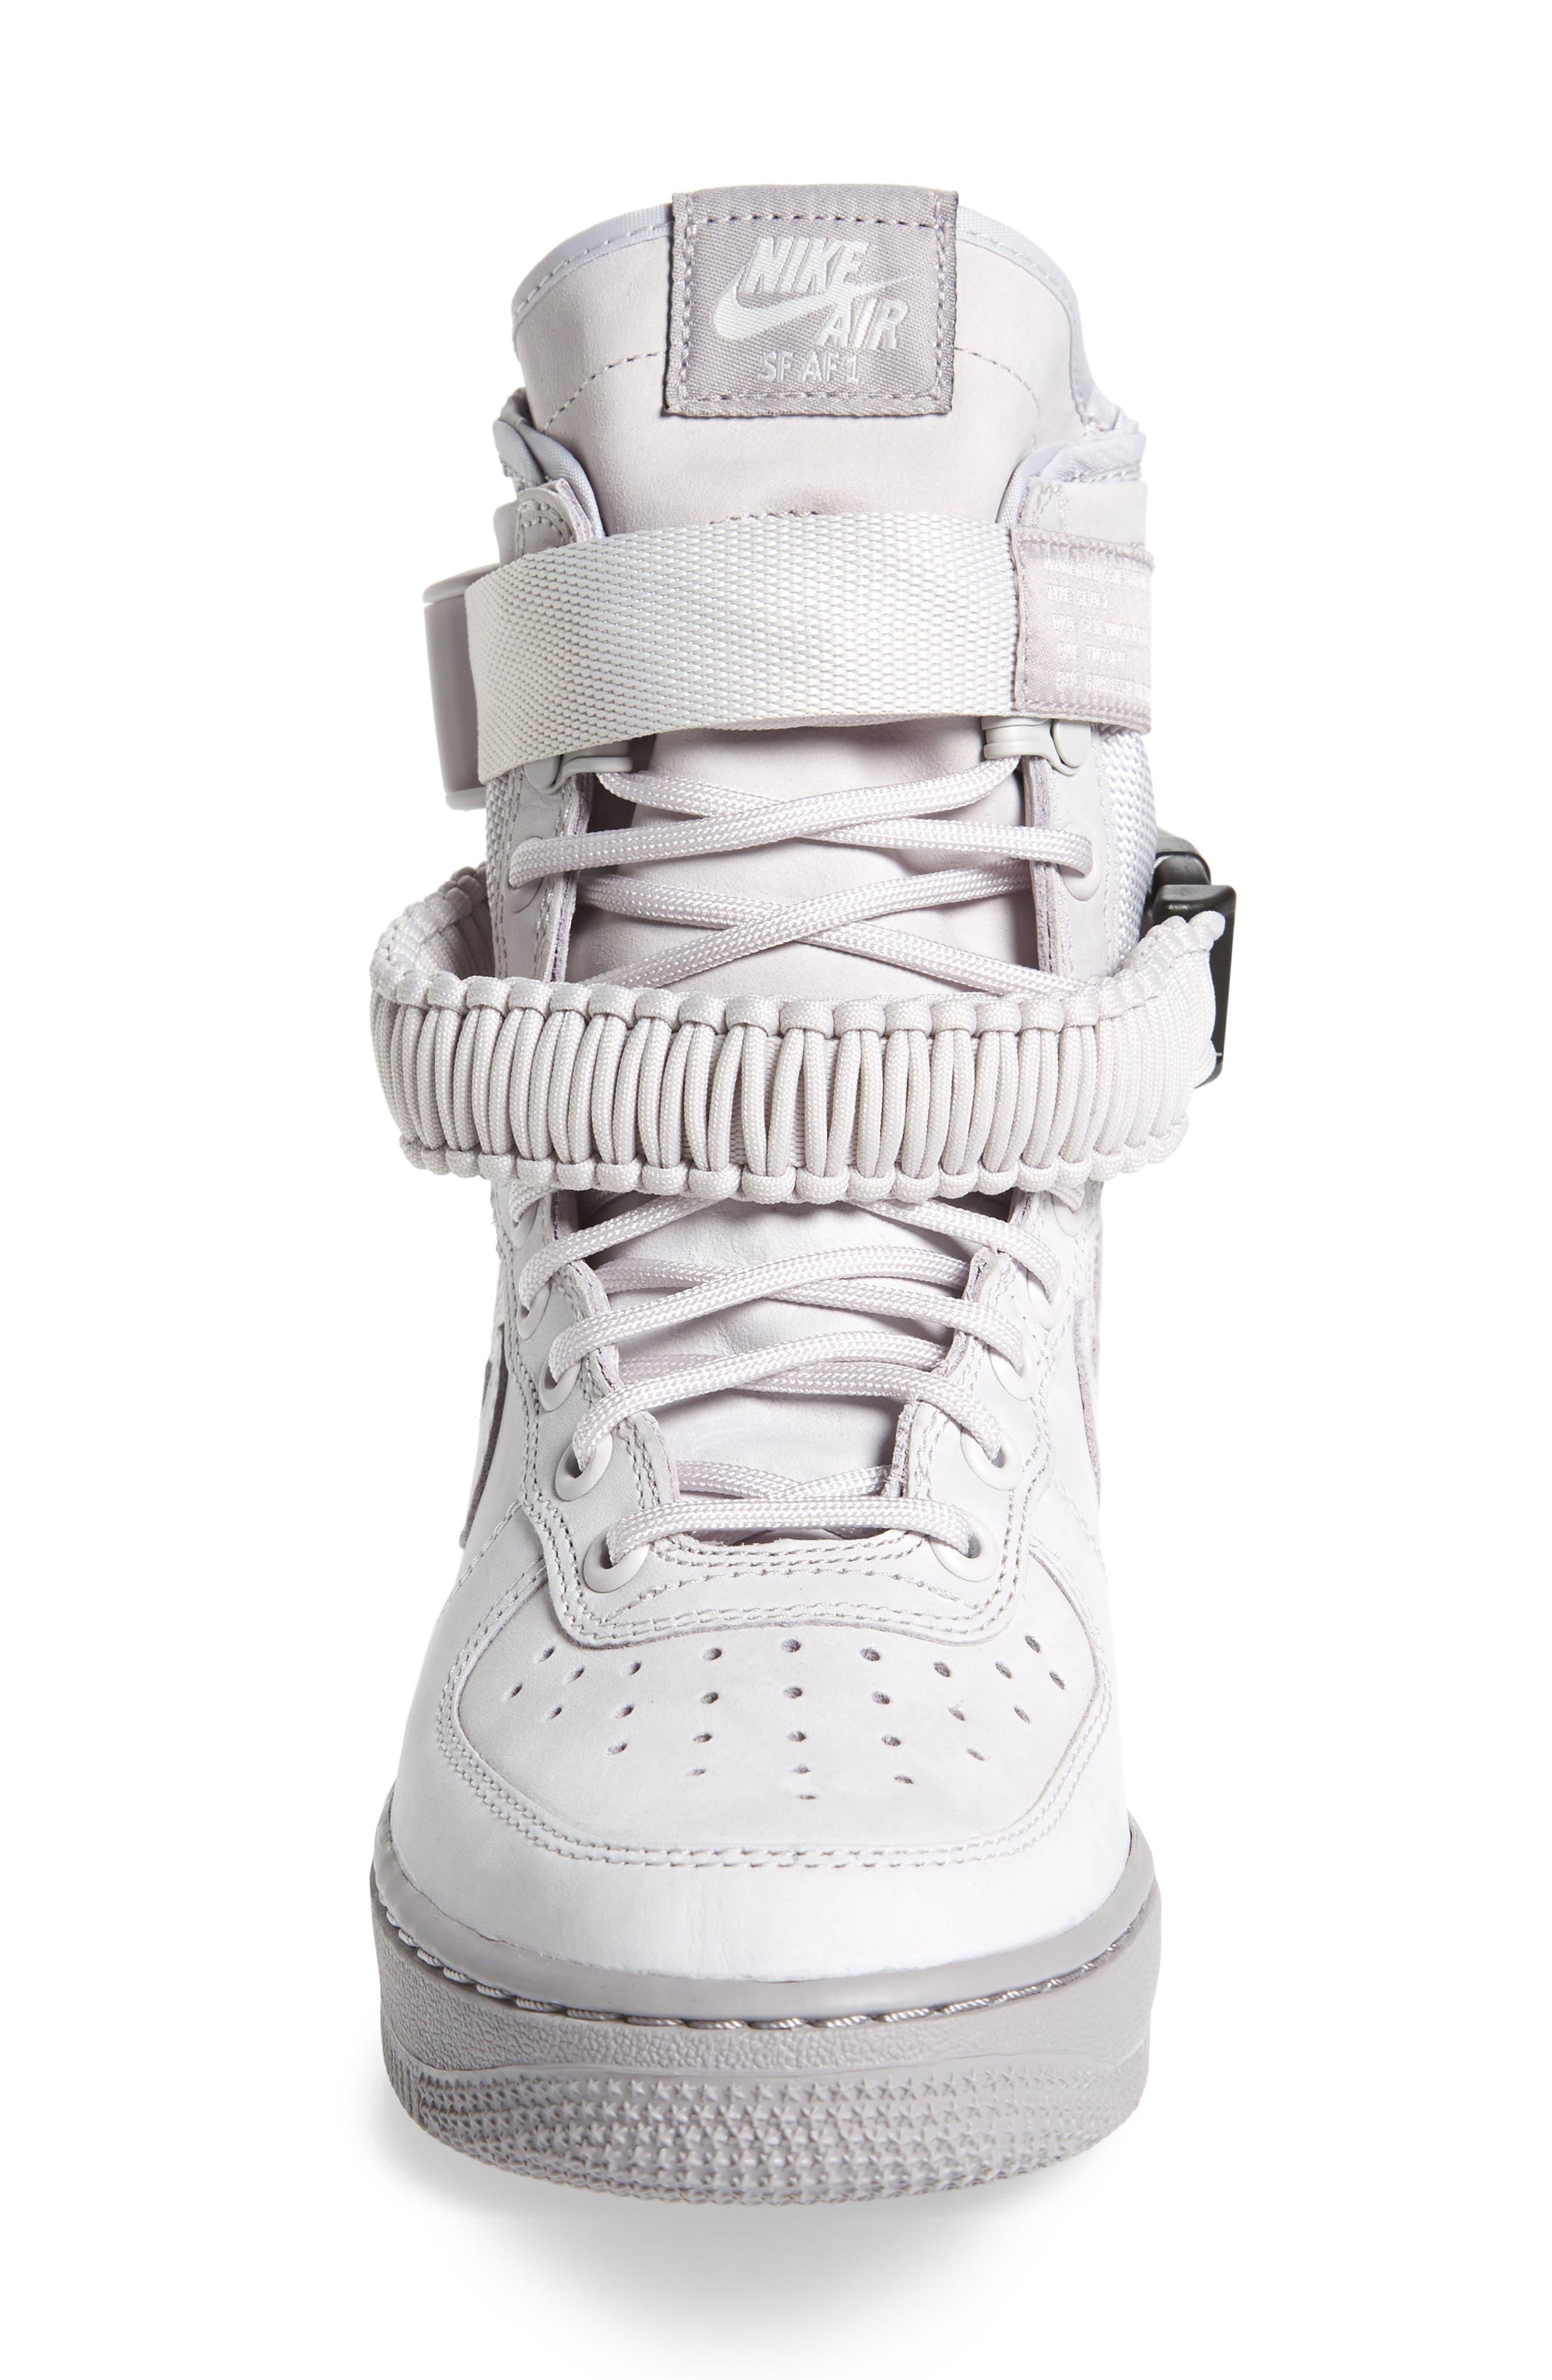 SF Air Force 1 High Top Sneaker,                             Alternate thumbnail 4, color,                             Vast Grey/ Vast Grey